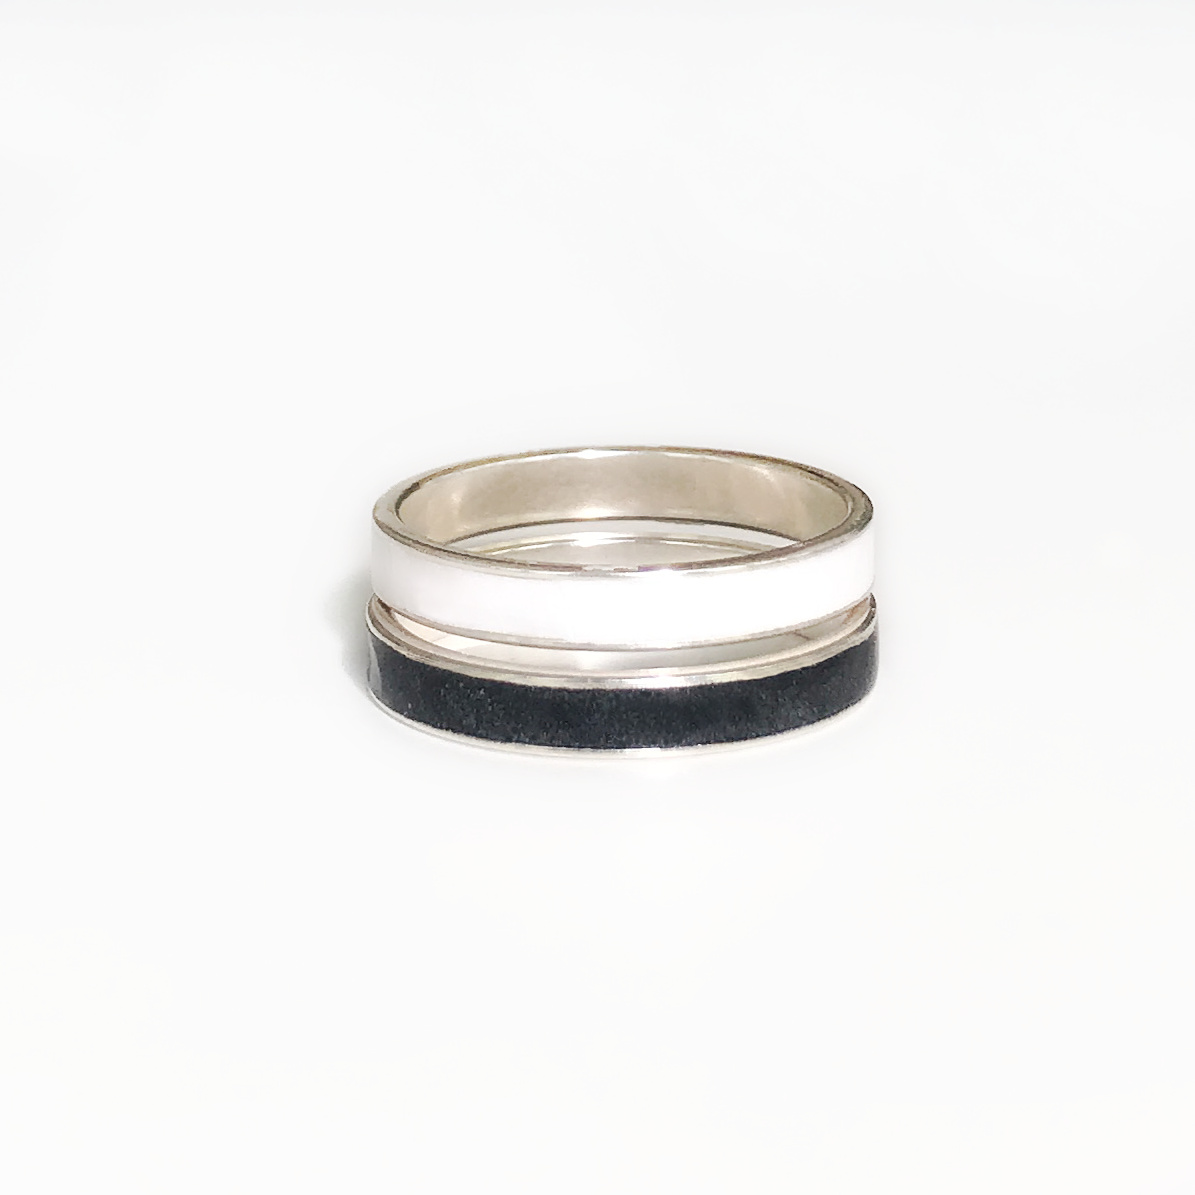 OATHKEEPER  rings from $15